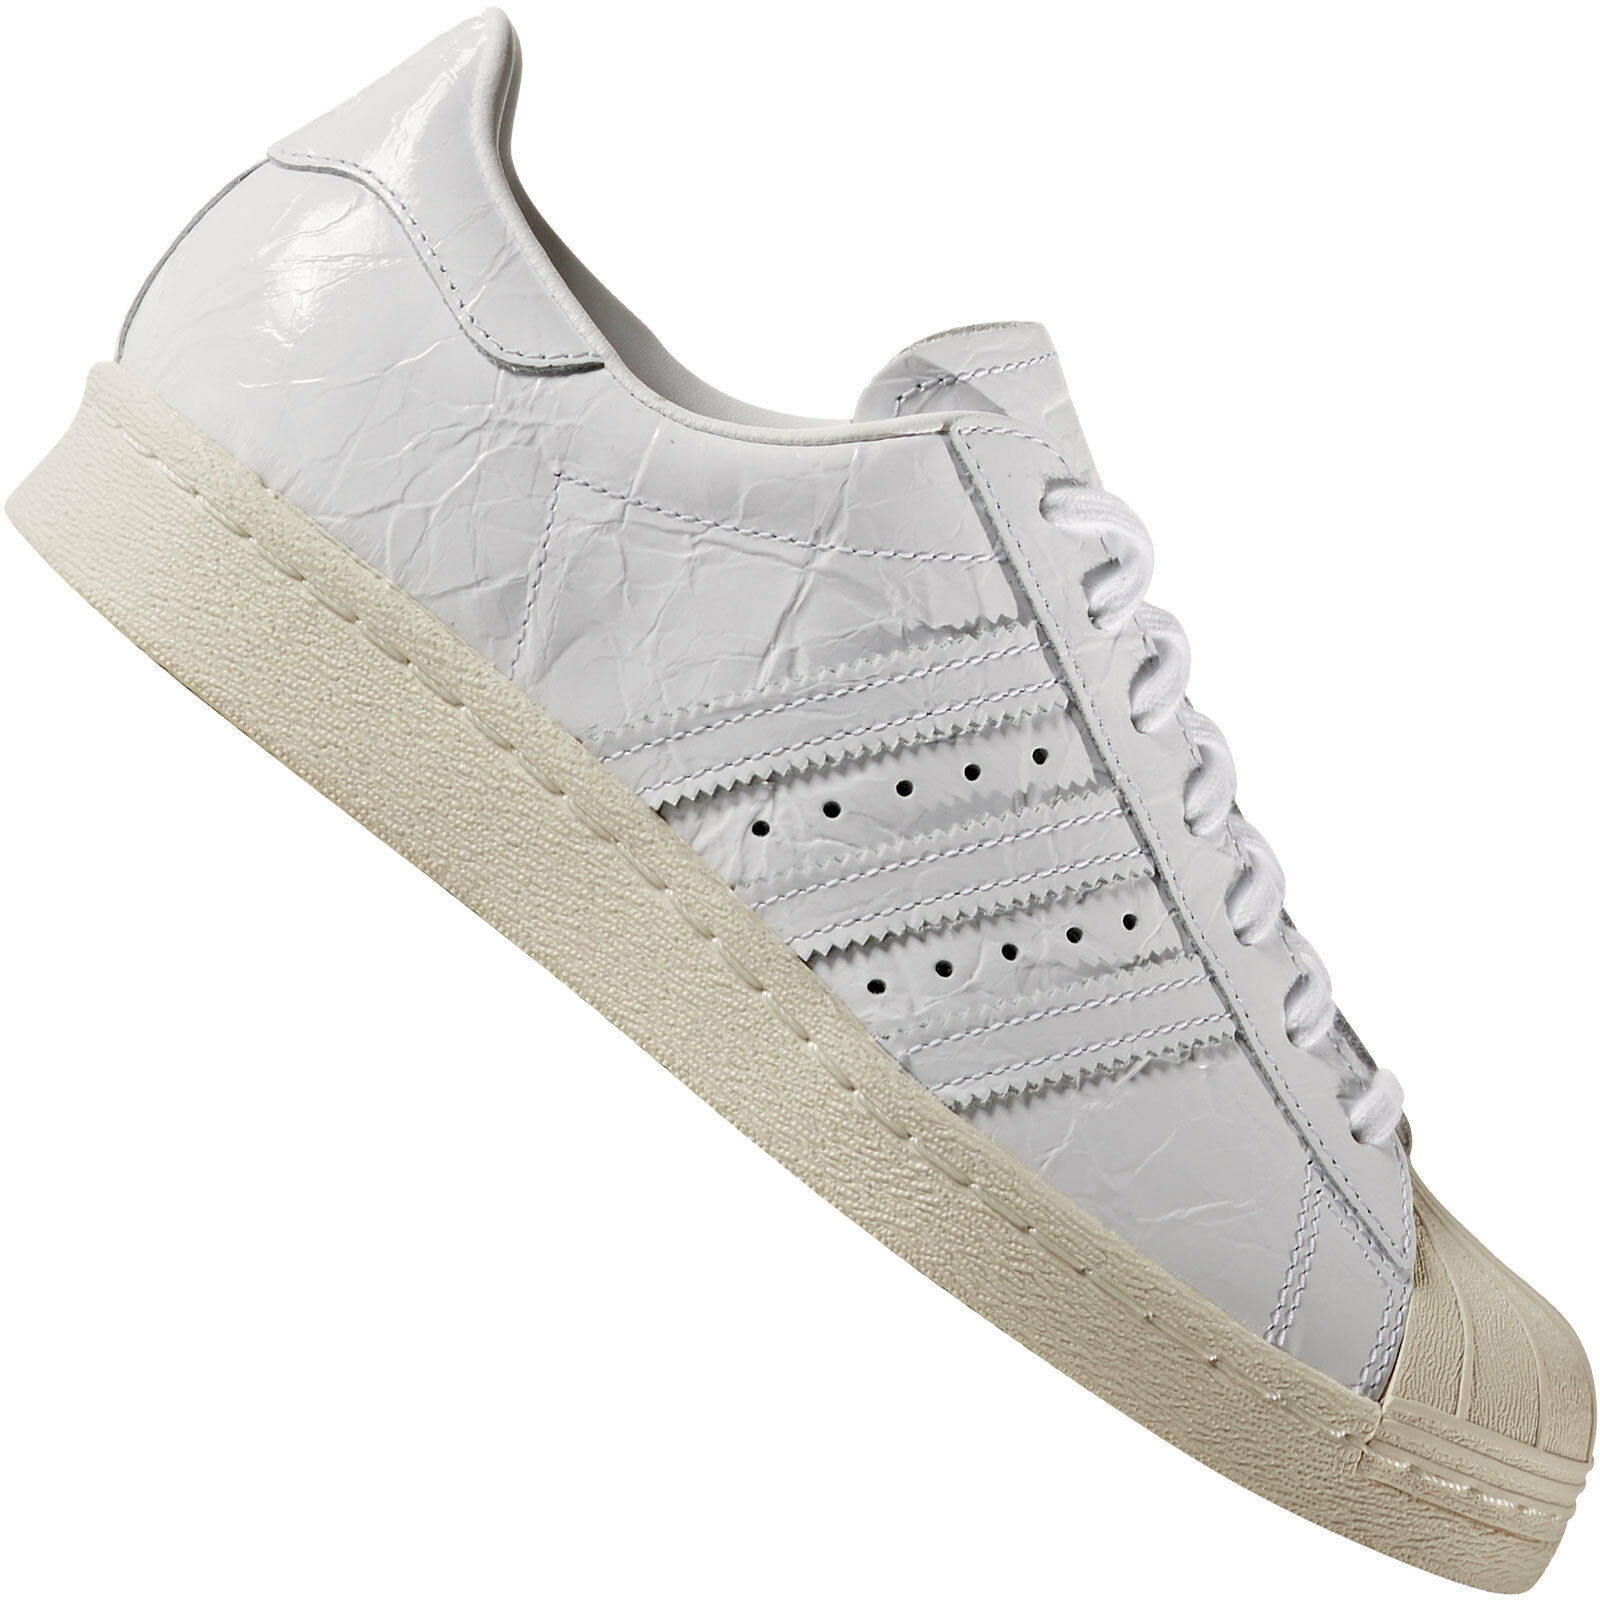 Adidas Originals Superstar Scarpe da Ginnastica Sneaker Donna Bianco